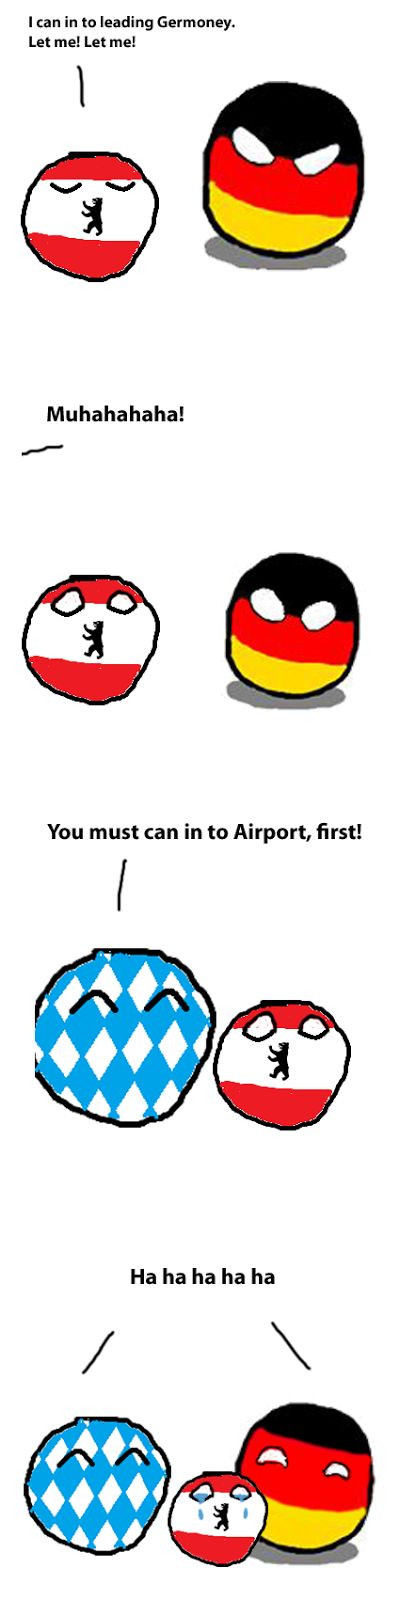 Germanball: Bavaria